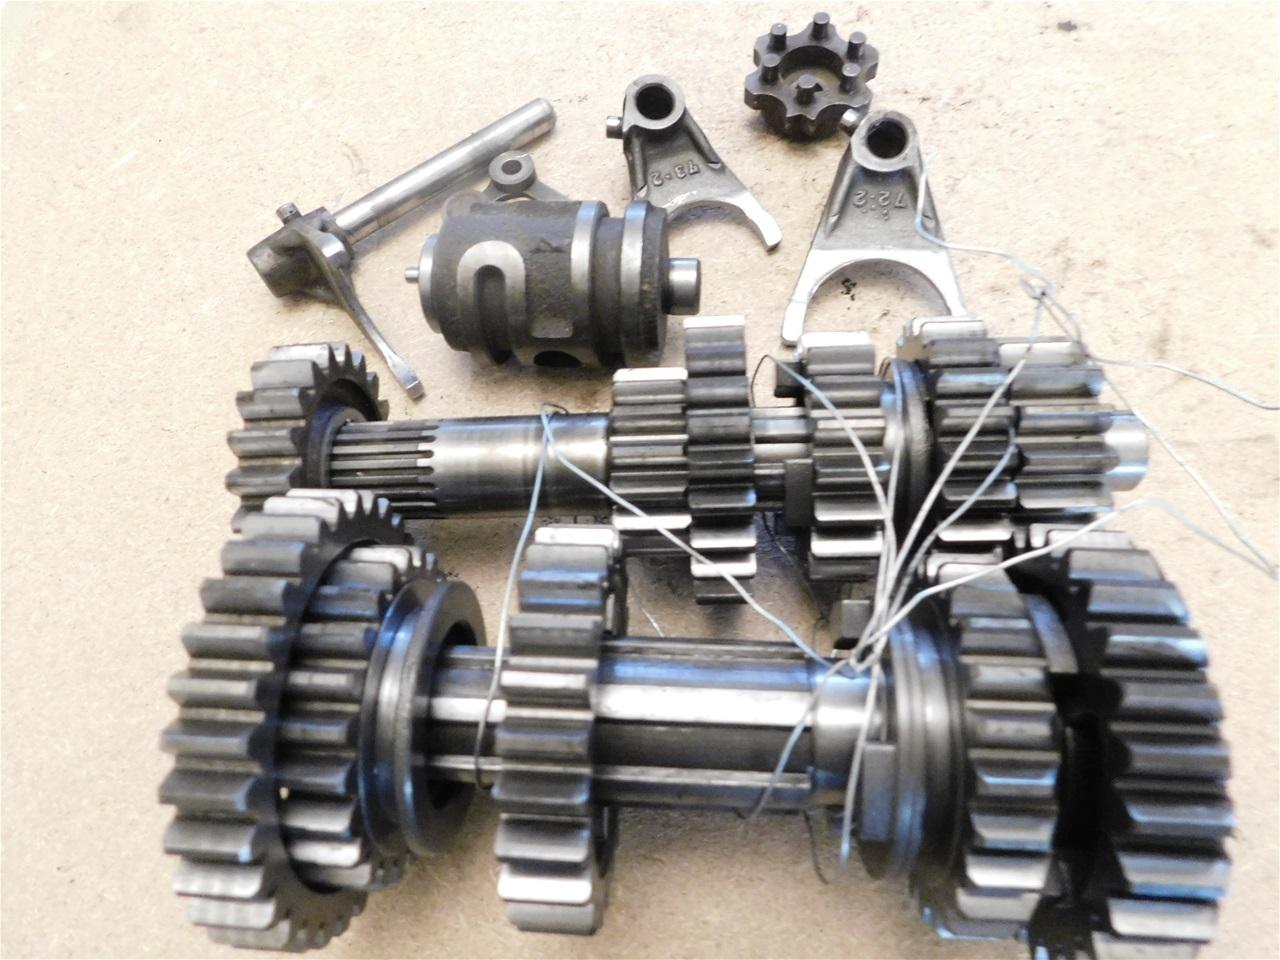 AA12.3 Kawasaki KX 250 Complete gearbox - R 1500